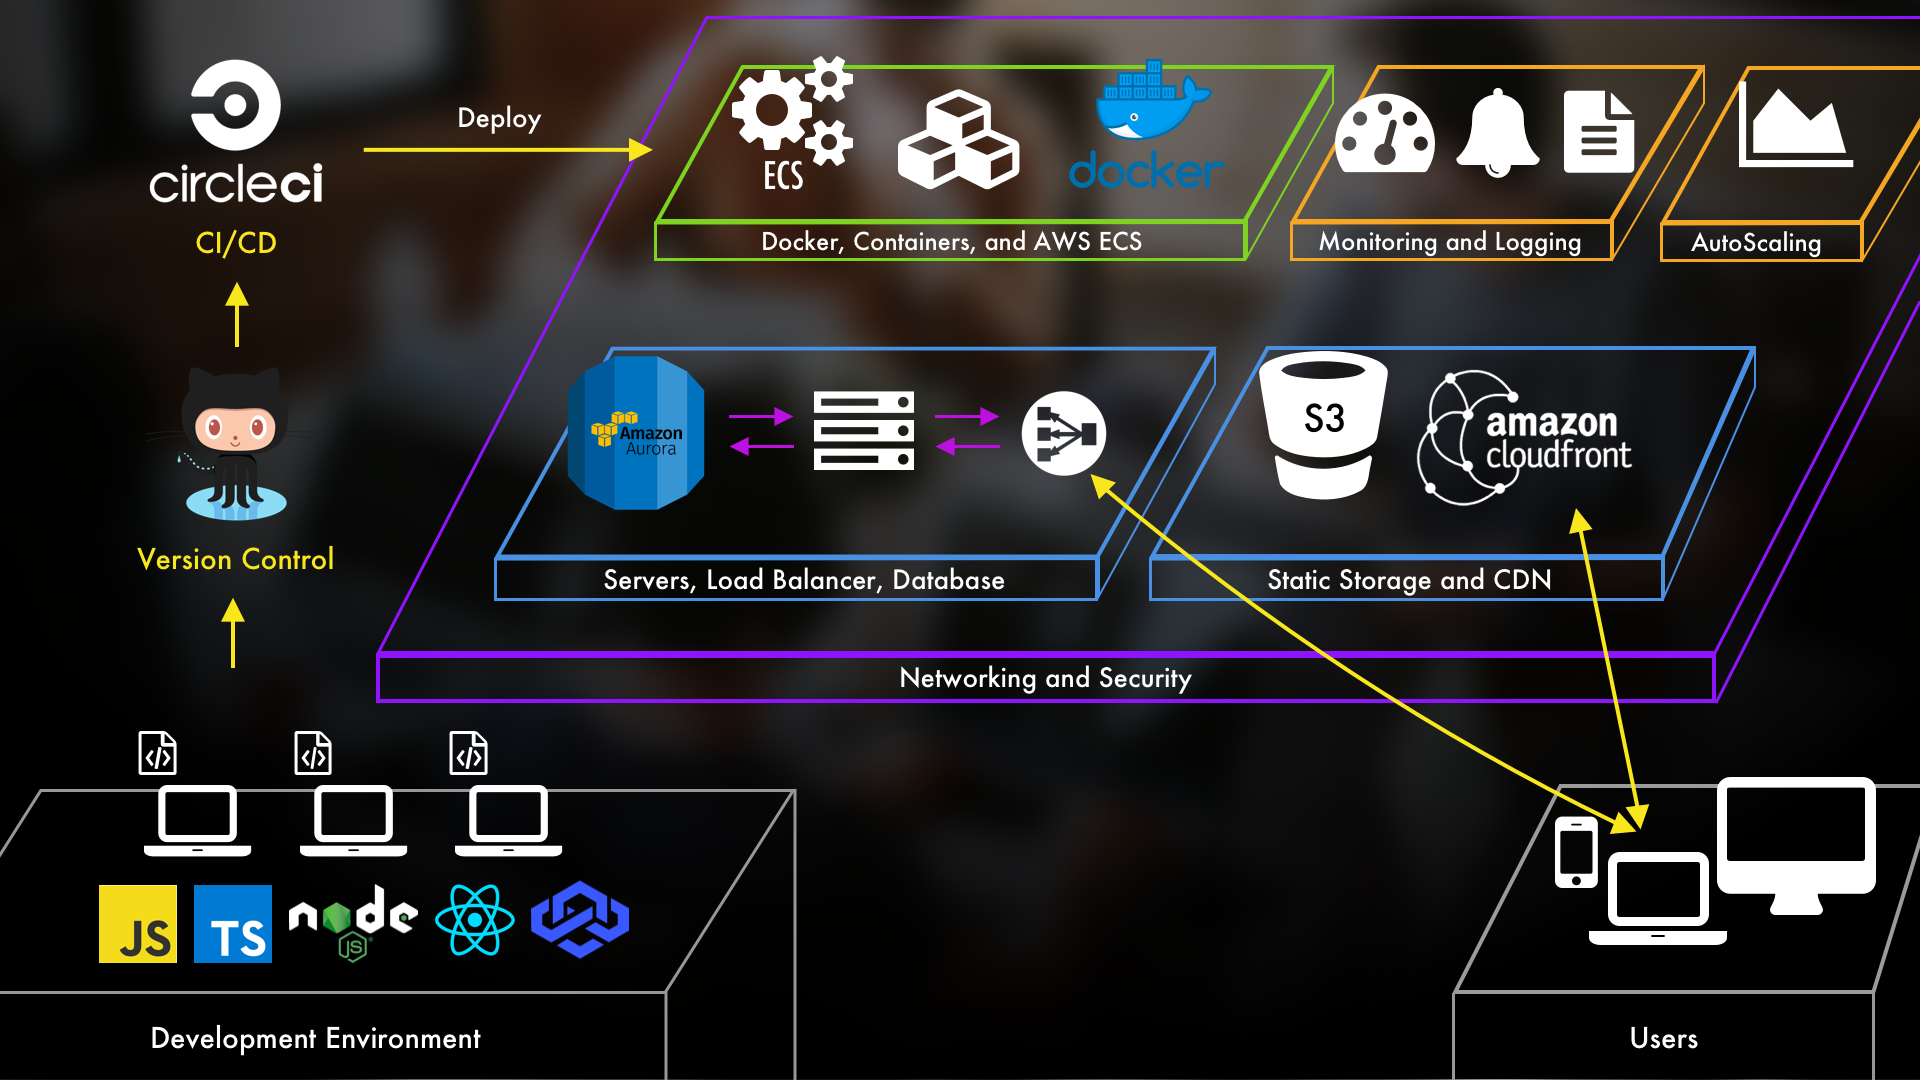 Build modern cloud architectures